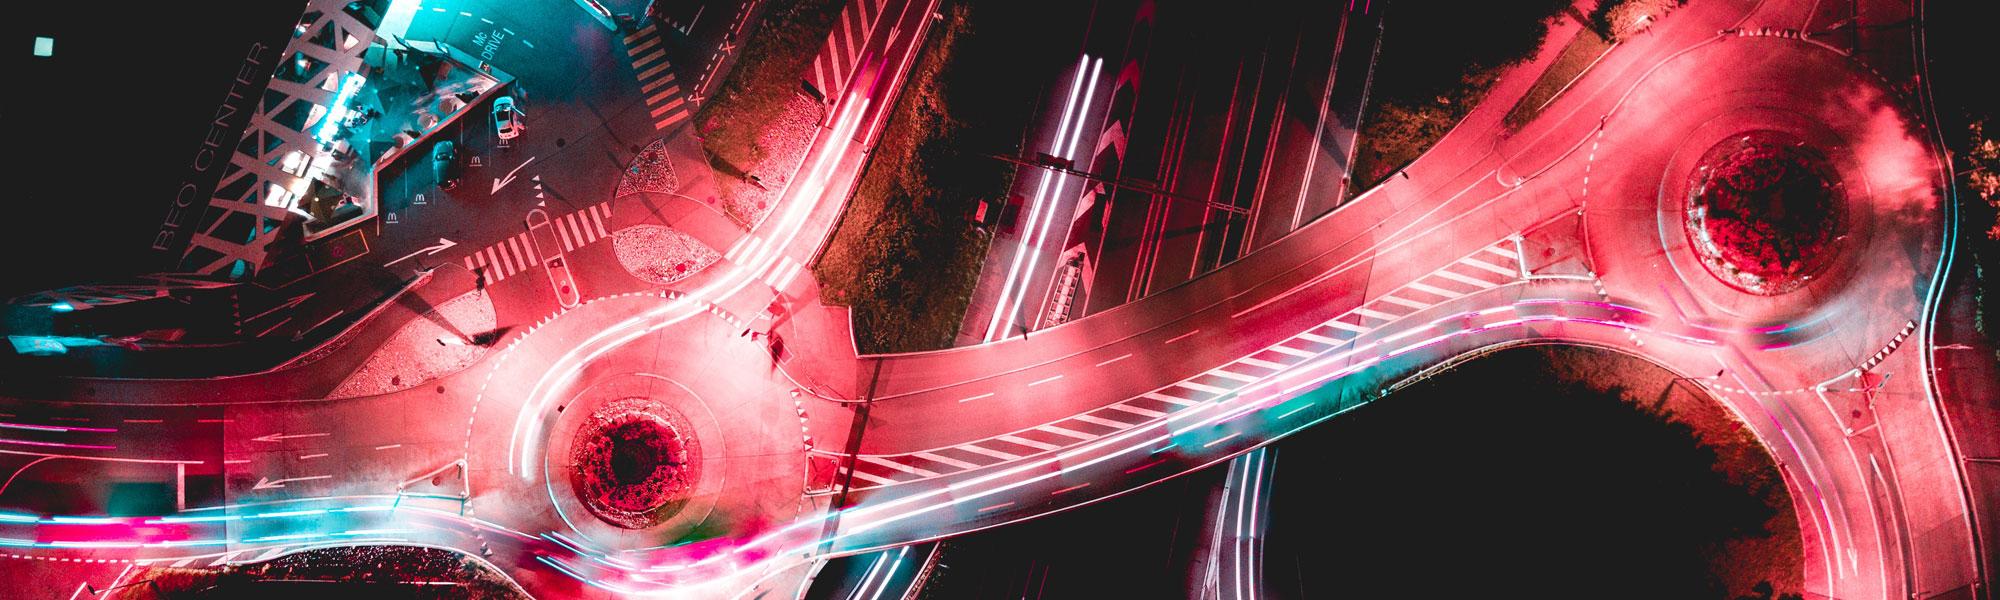 Red lights on interchange Photo byRaphael SchalleronUnsplash